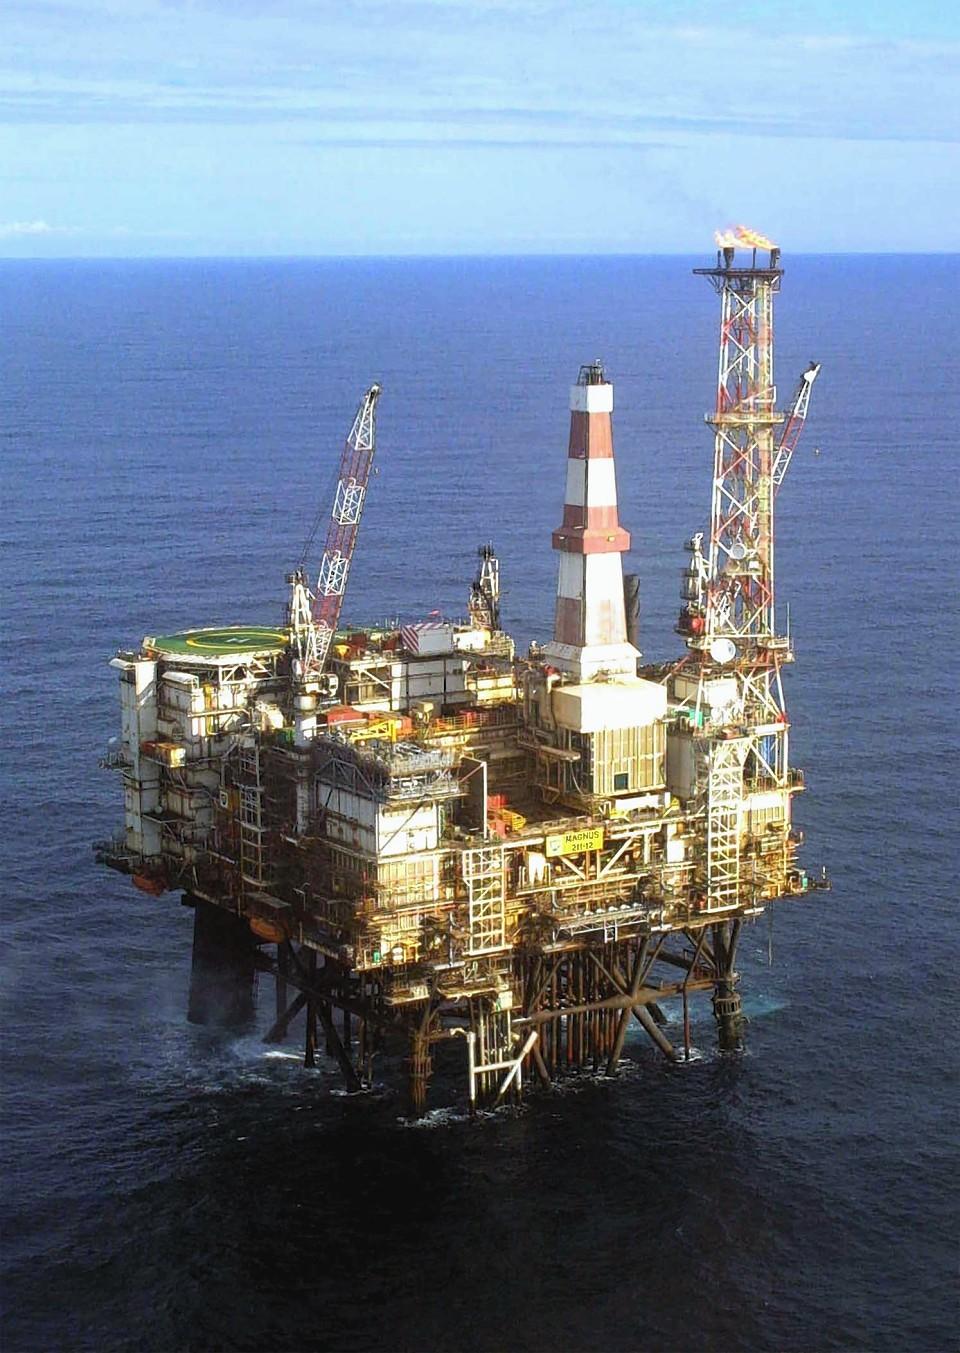 The Magnus platform in the North Sea.